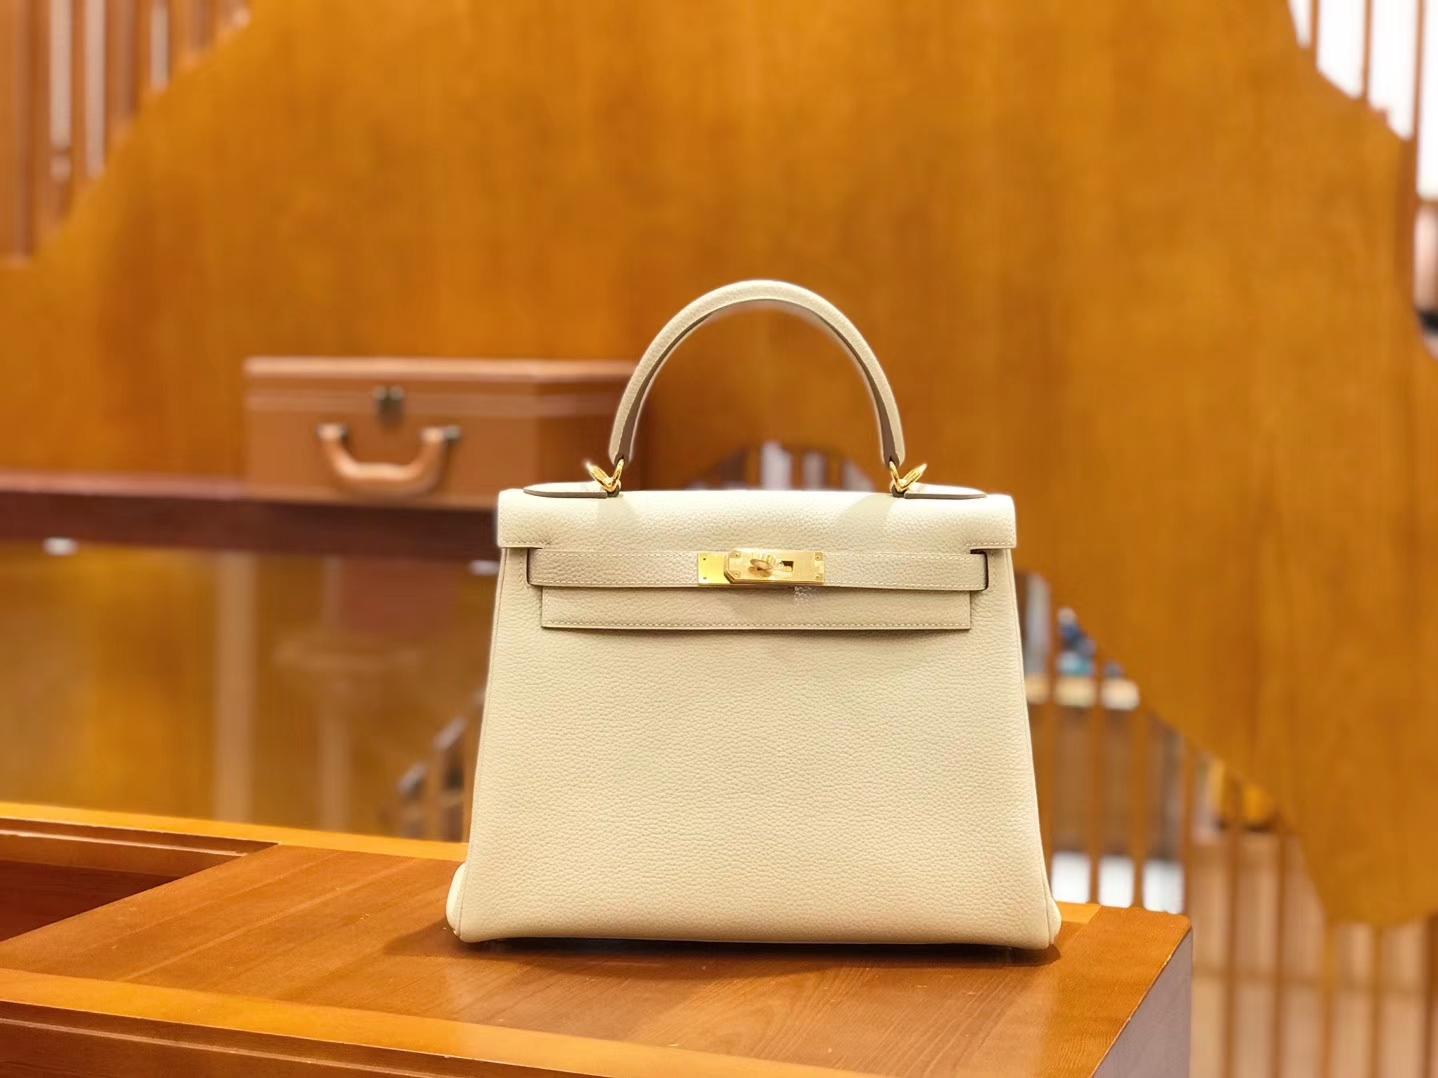 Hermès(爱马仕)Kelly 28cm togo 牛皮 奶昔白 金扣 全手工缝制 现货